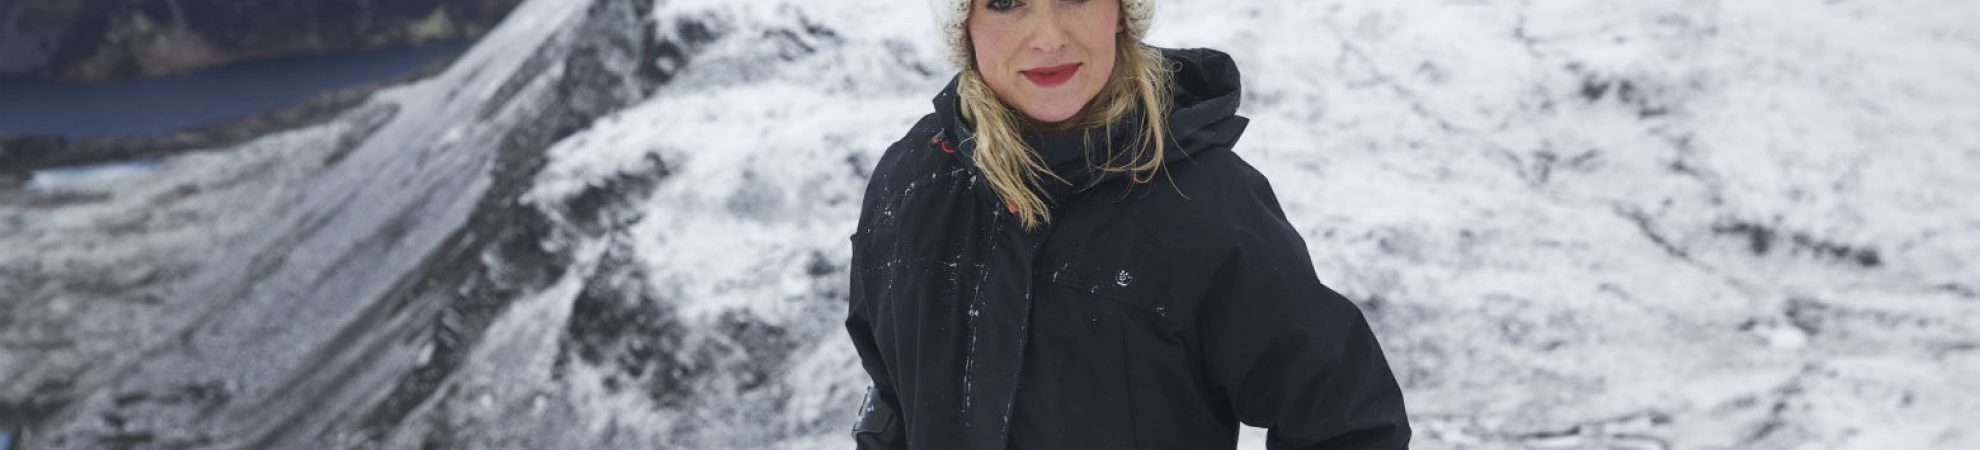 Nikki Bradley on Mt. Errigal